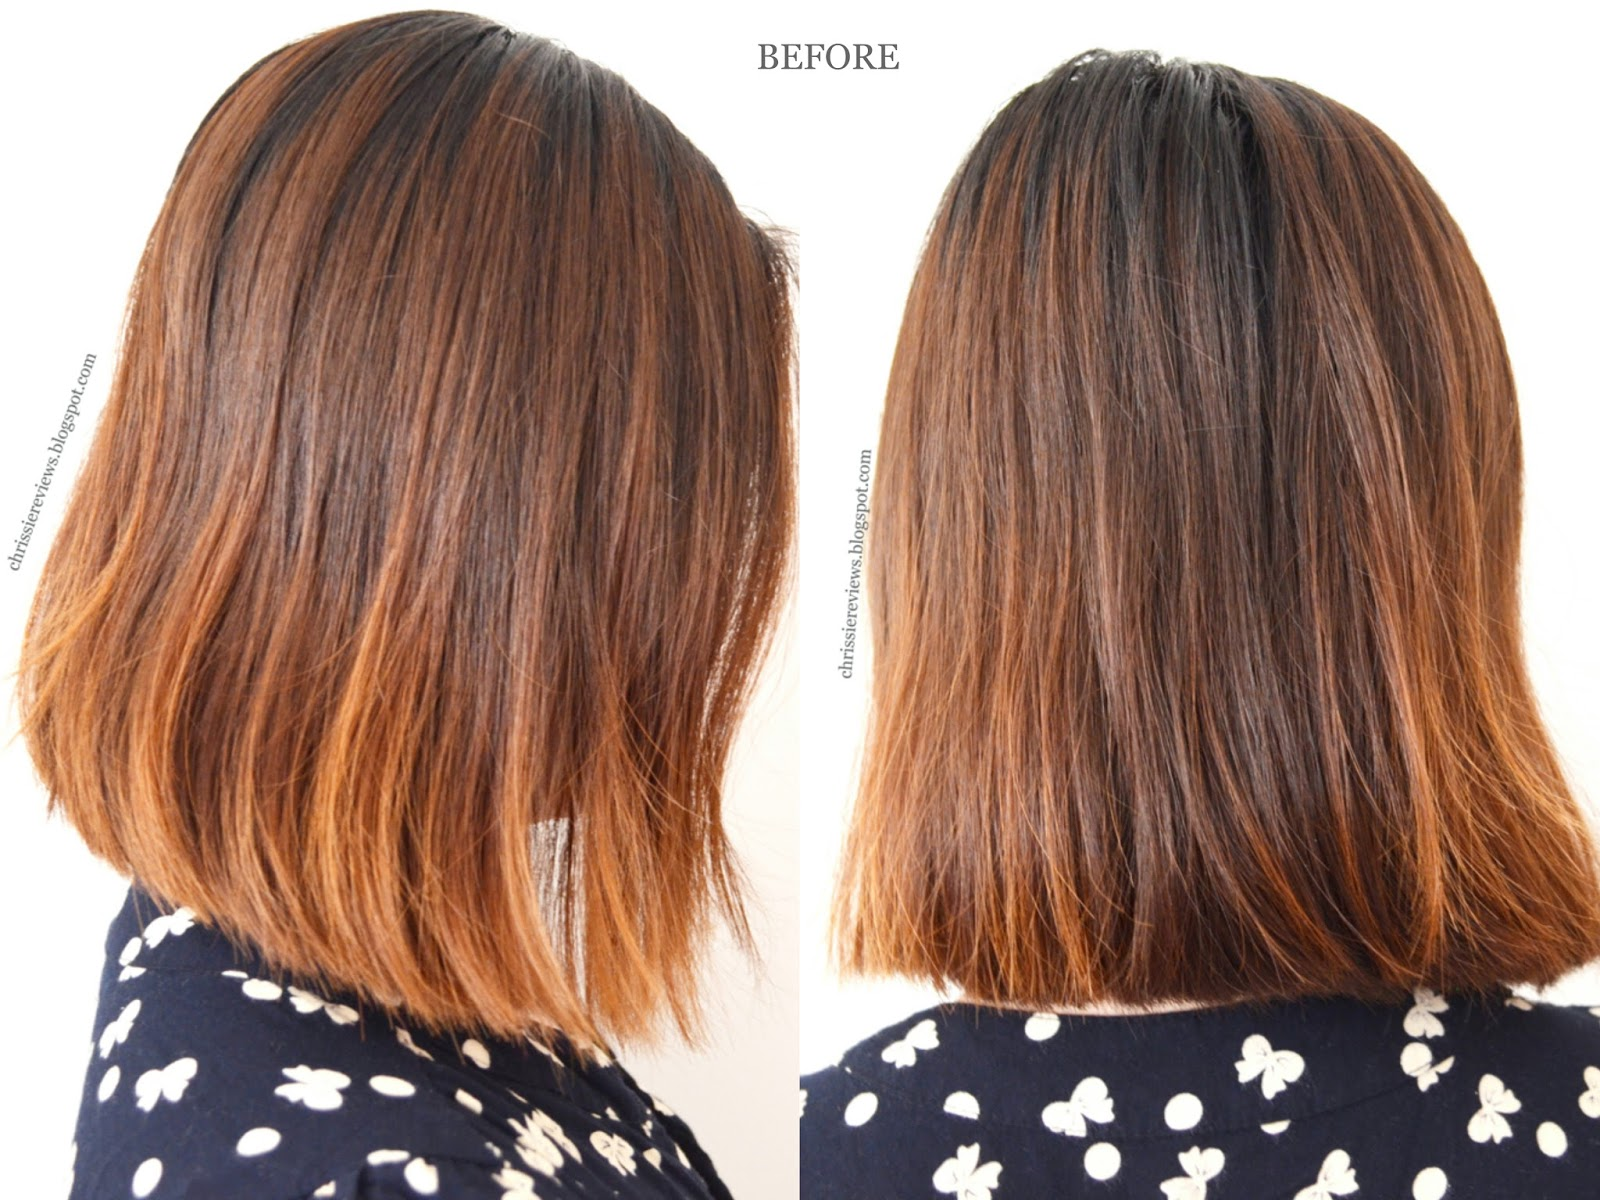 Review Ryo Ryeo Ryoe Yangnyeongwon Grey Hair Covering Cream 40